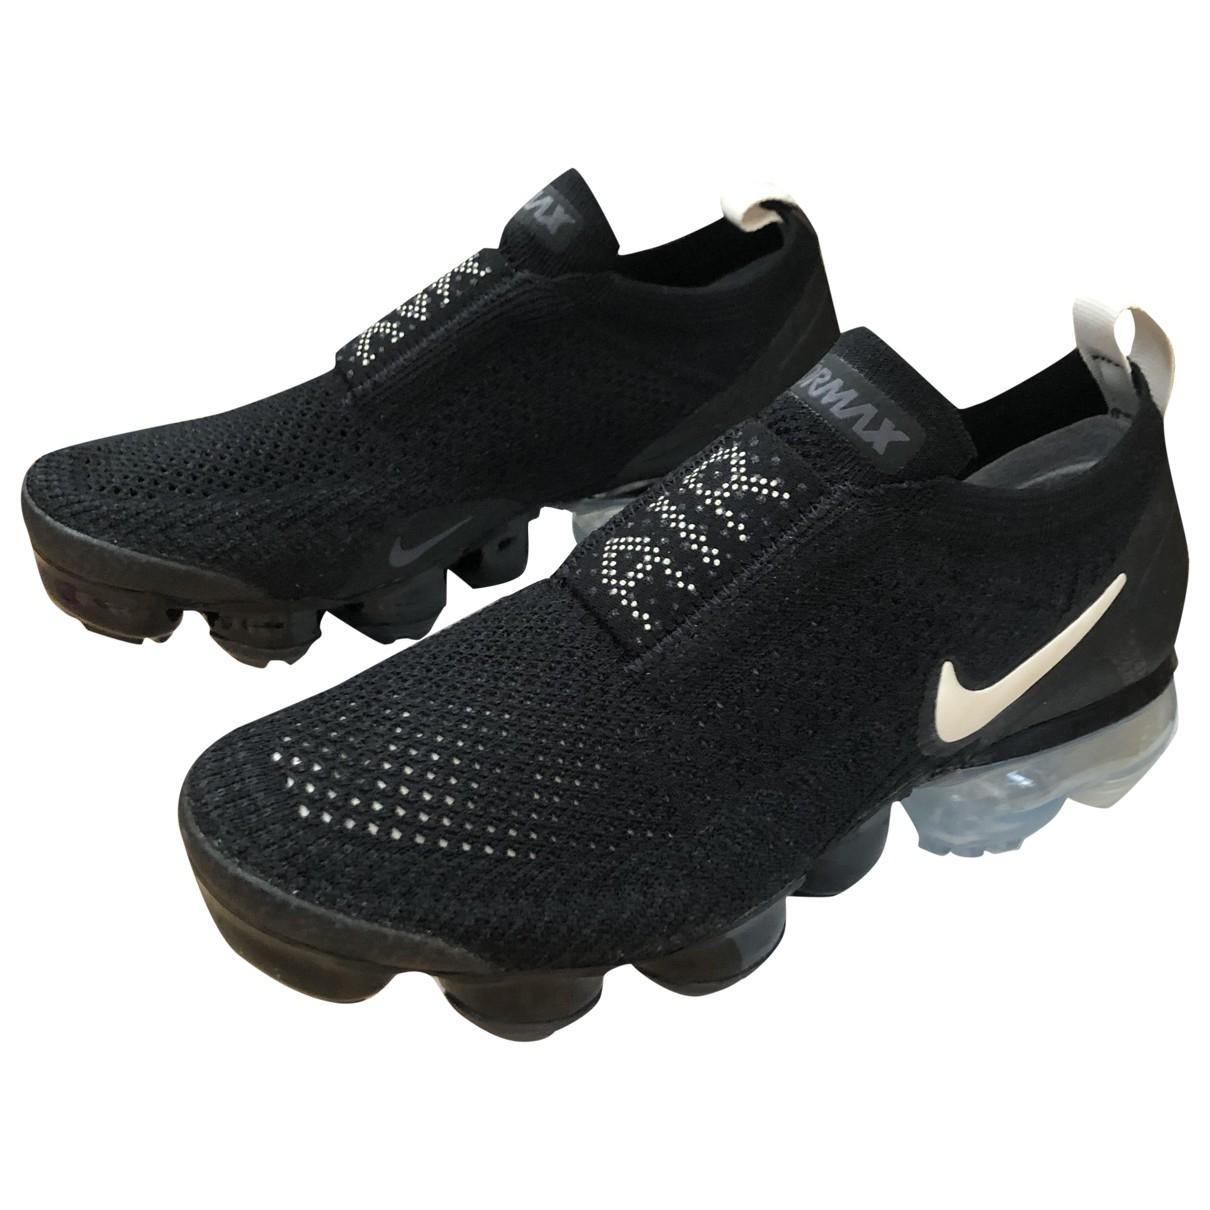 Nike VaporMax Plus Black Trainers for Kids 36 FR